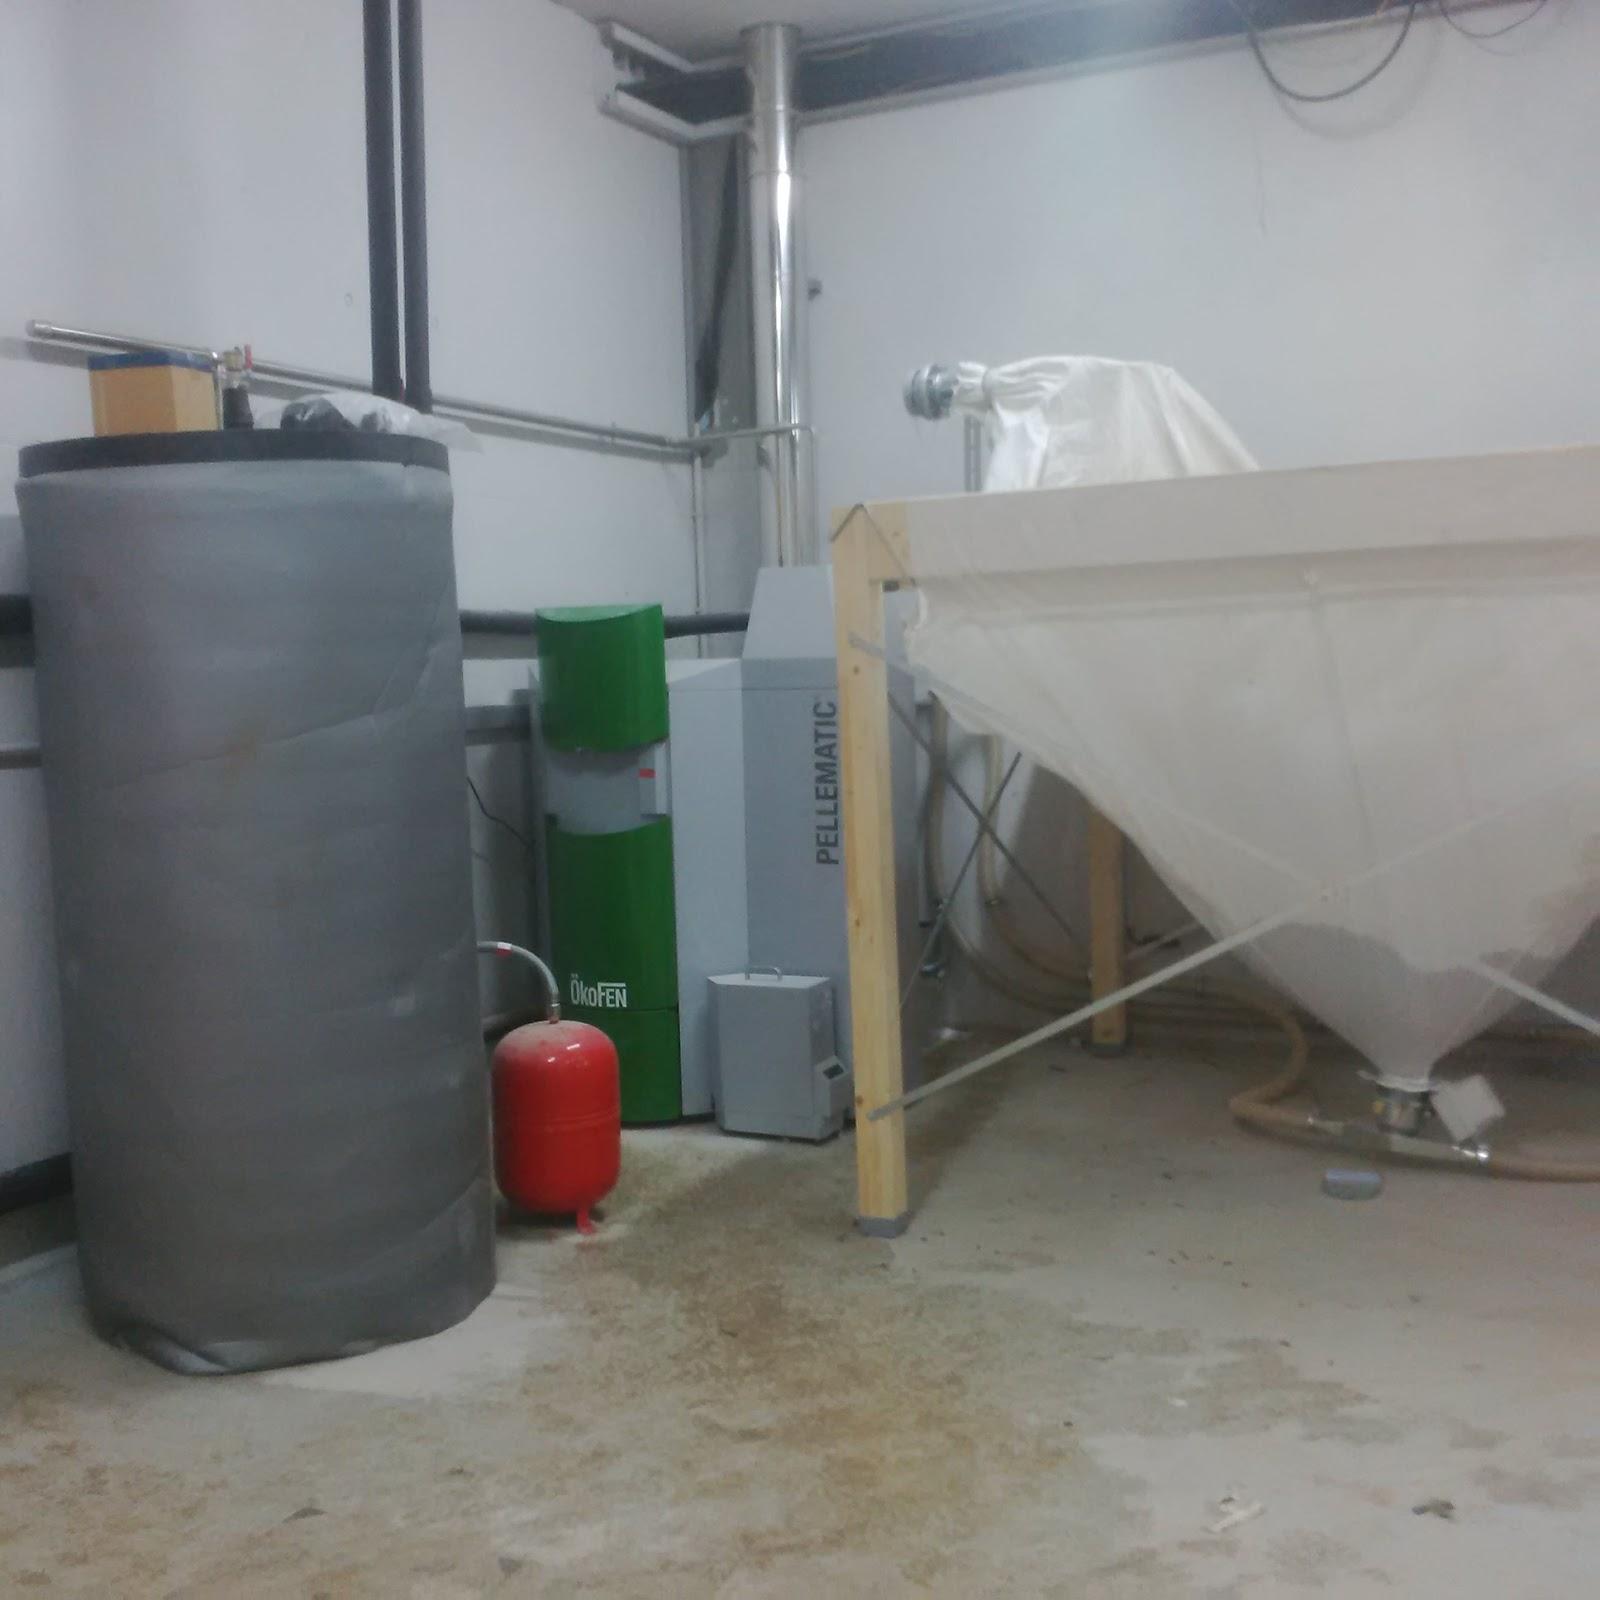 Calderas de biomasa seguimos prefiriendo biomasa - Caldera para suelo radiante ...